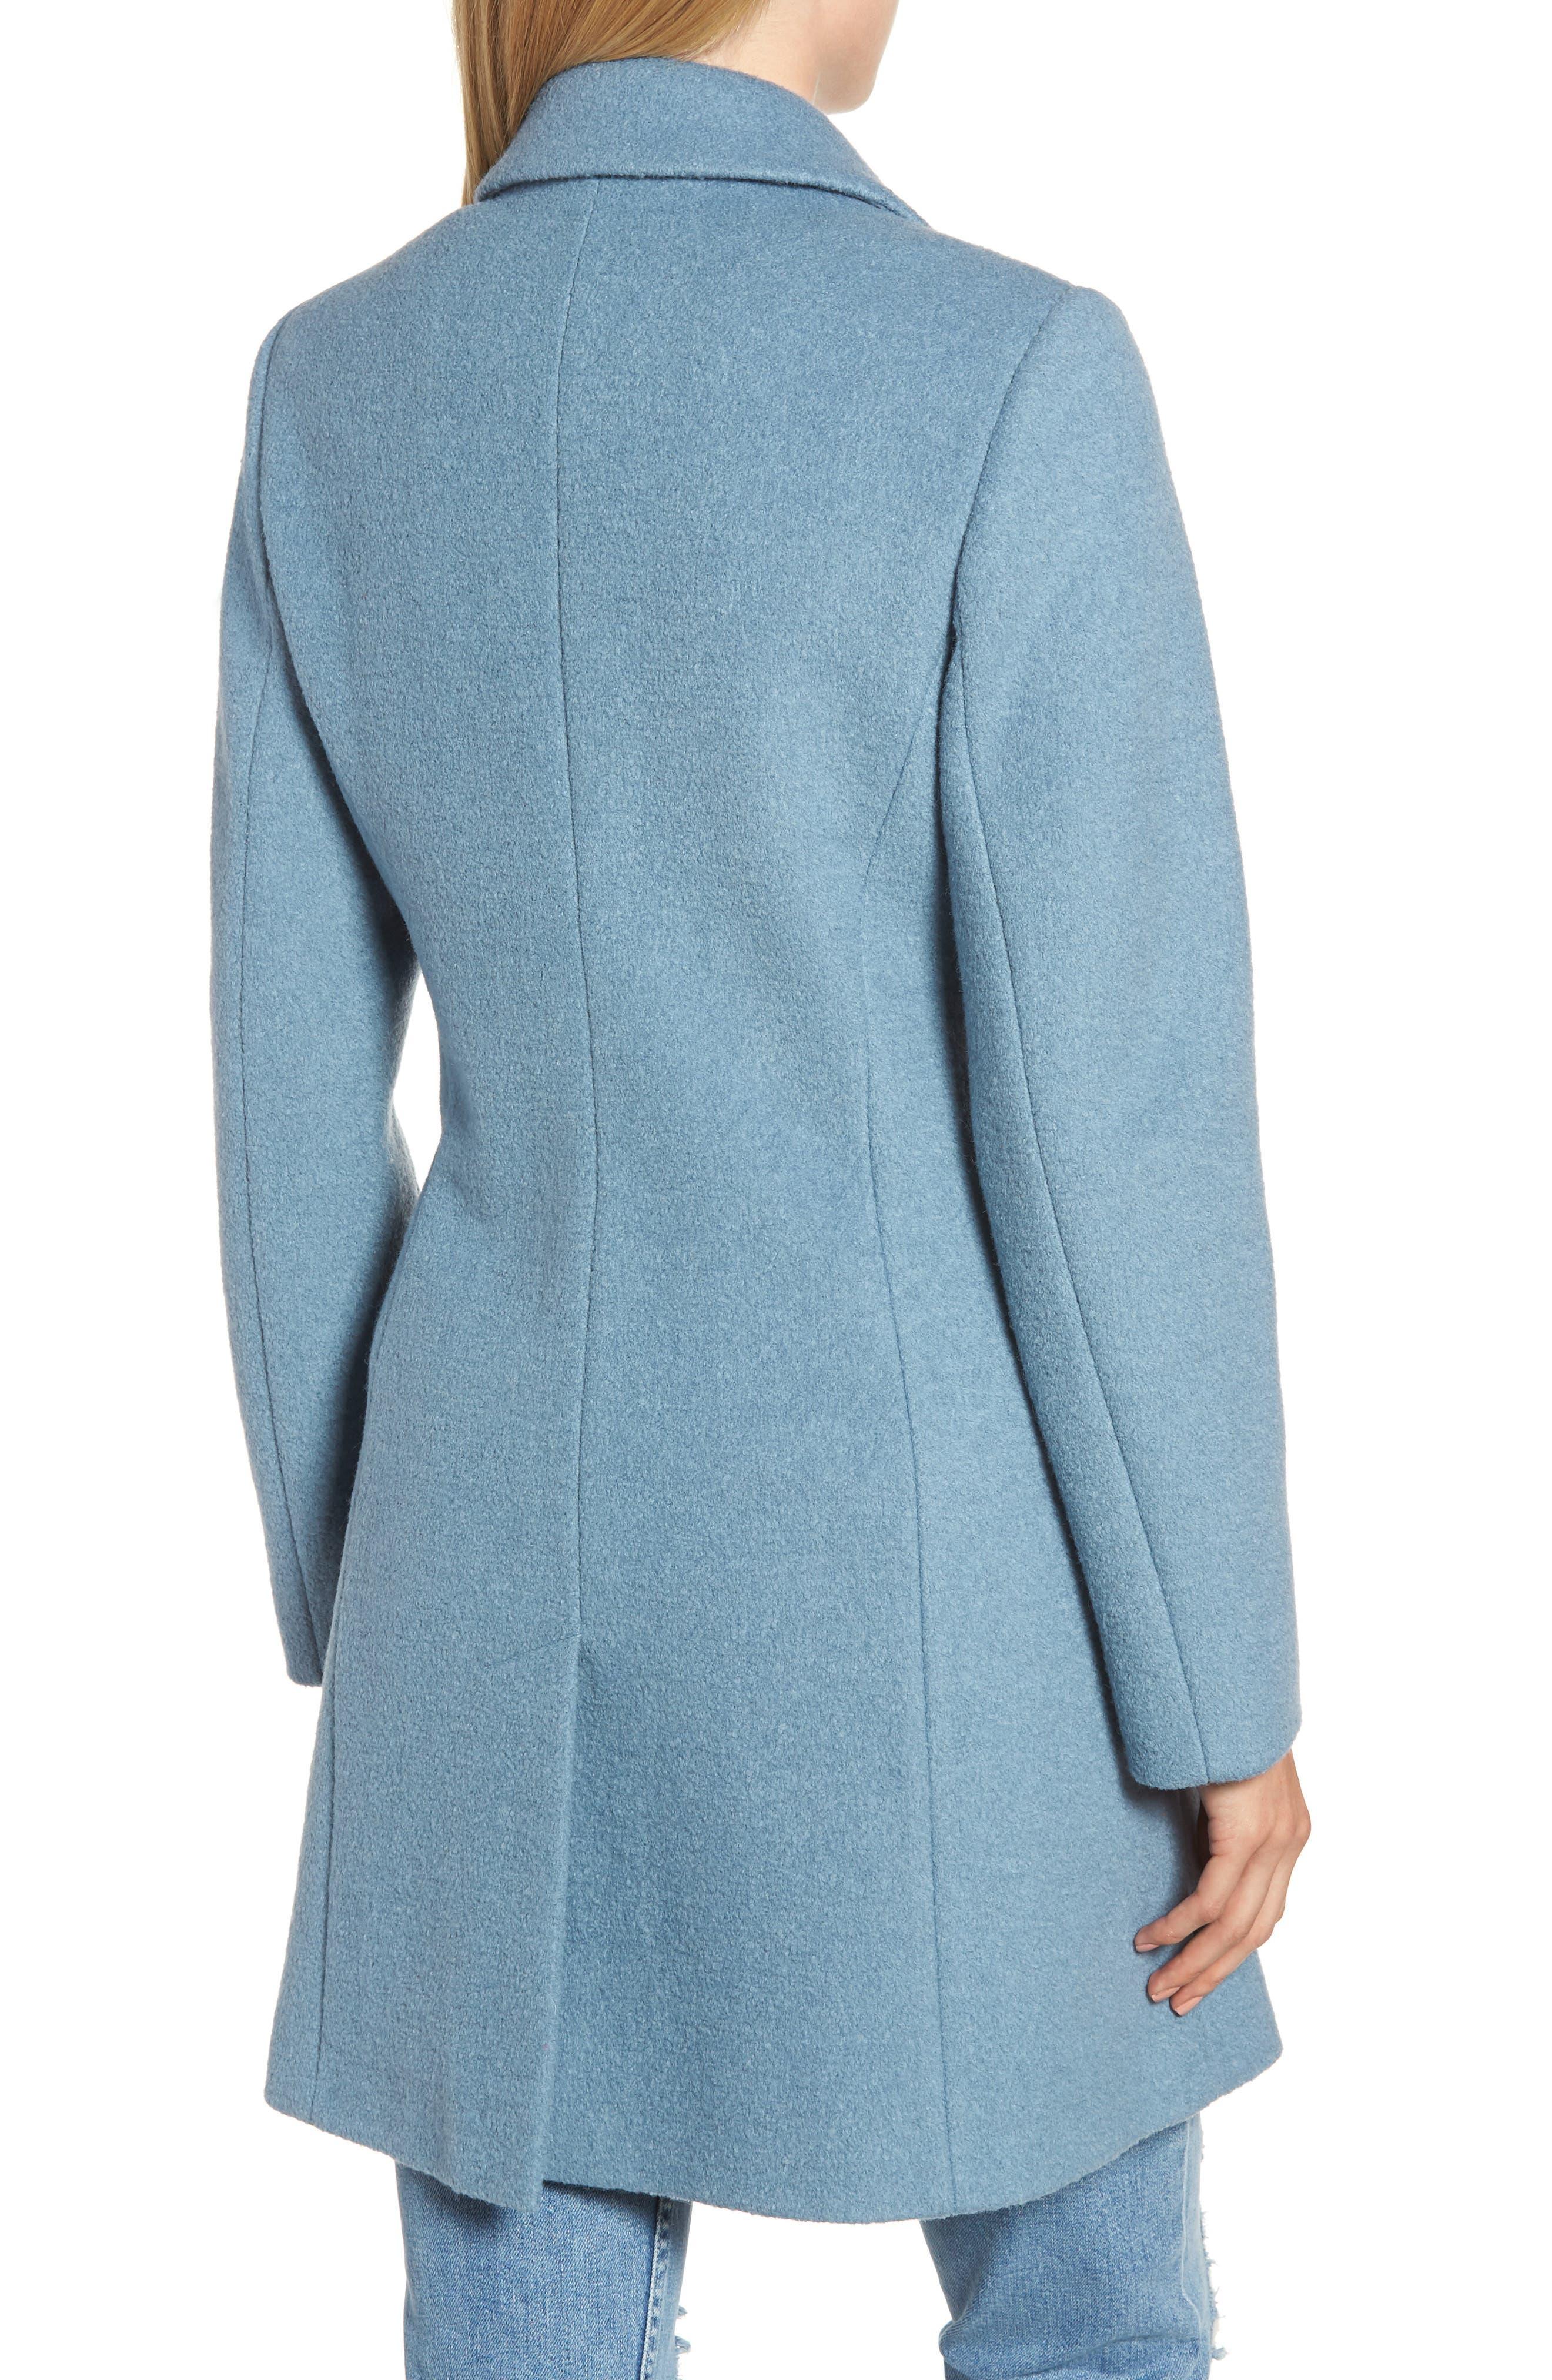 Blazer Jacket,                             Alternate thumbnail 2, color,                             LIGHT BLUE